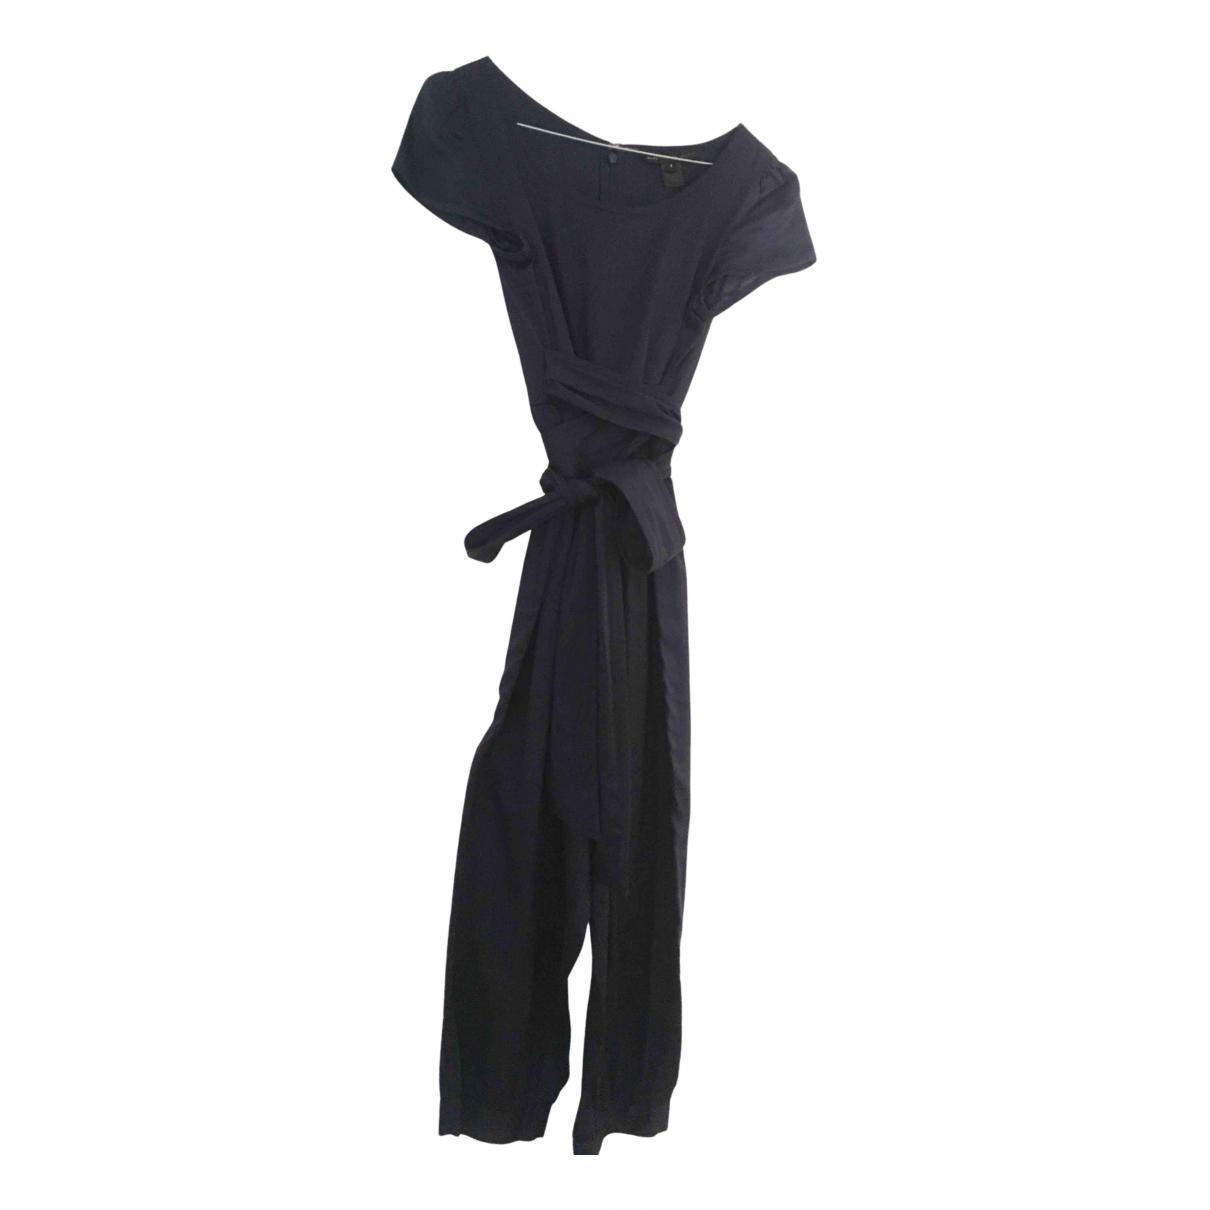 Marc By Marc Jacobs N Blue Cotton jumpsuit for Women 2 US